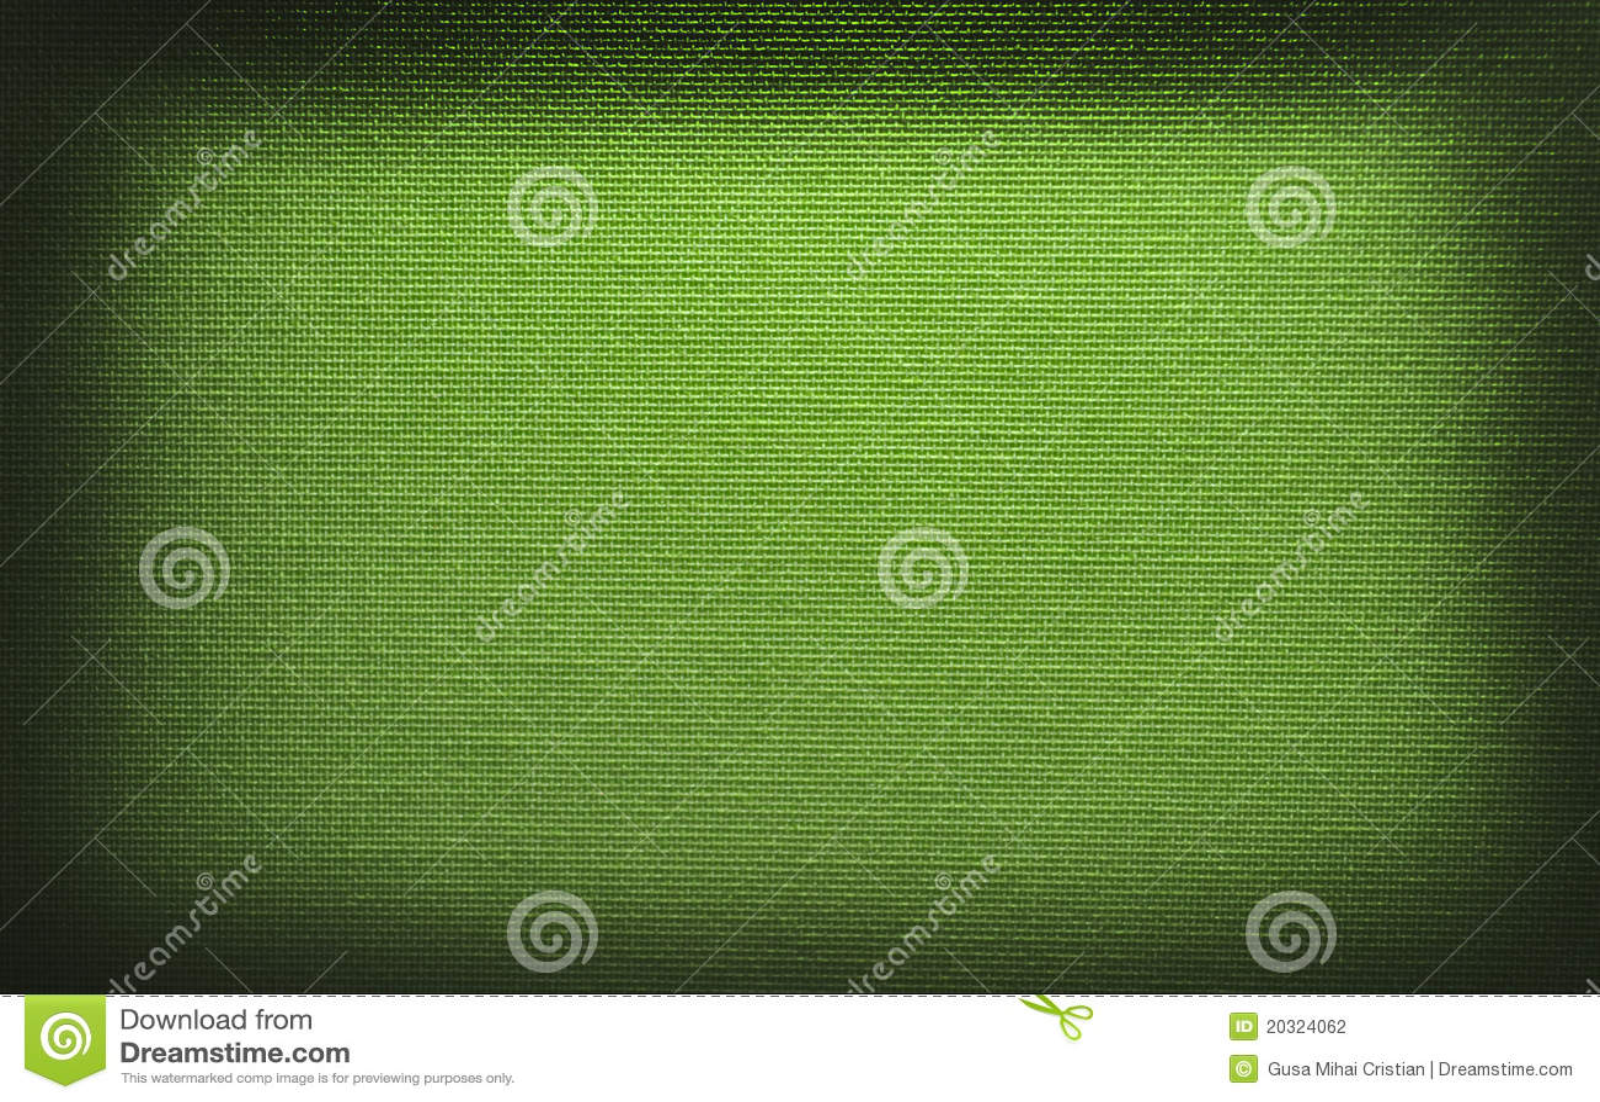 Texture vert clair de toile